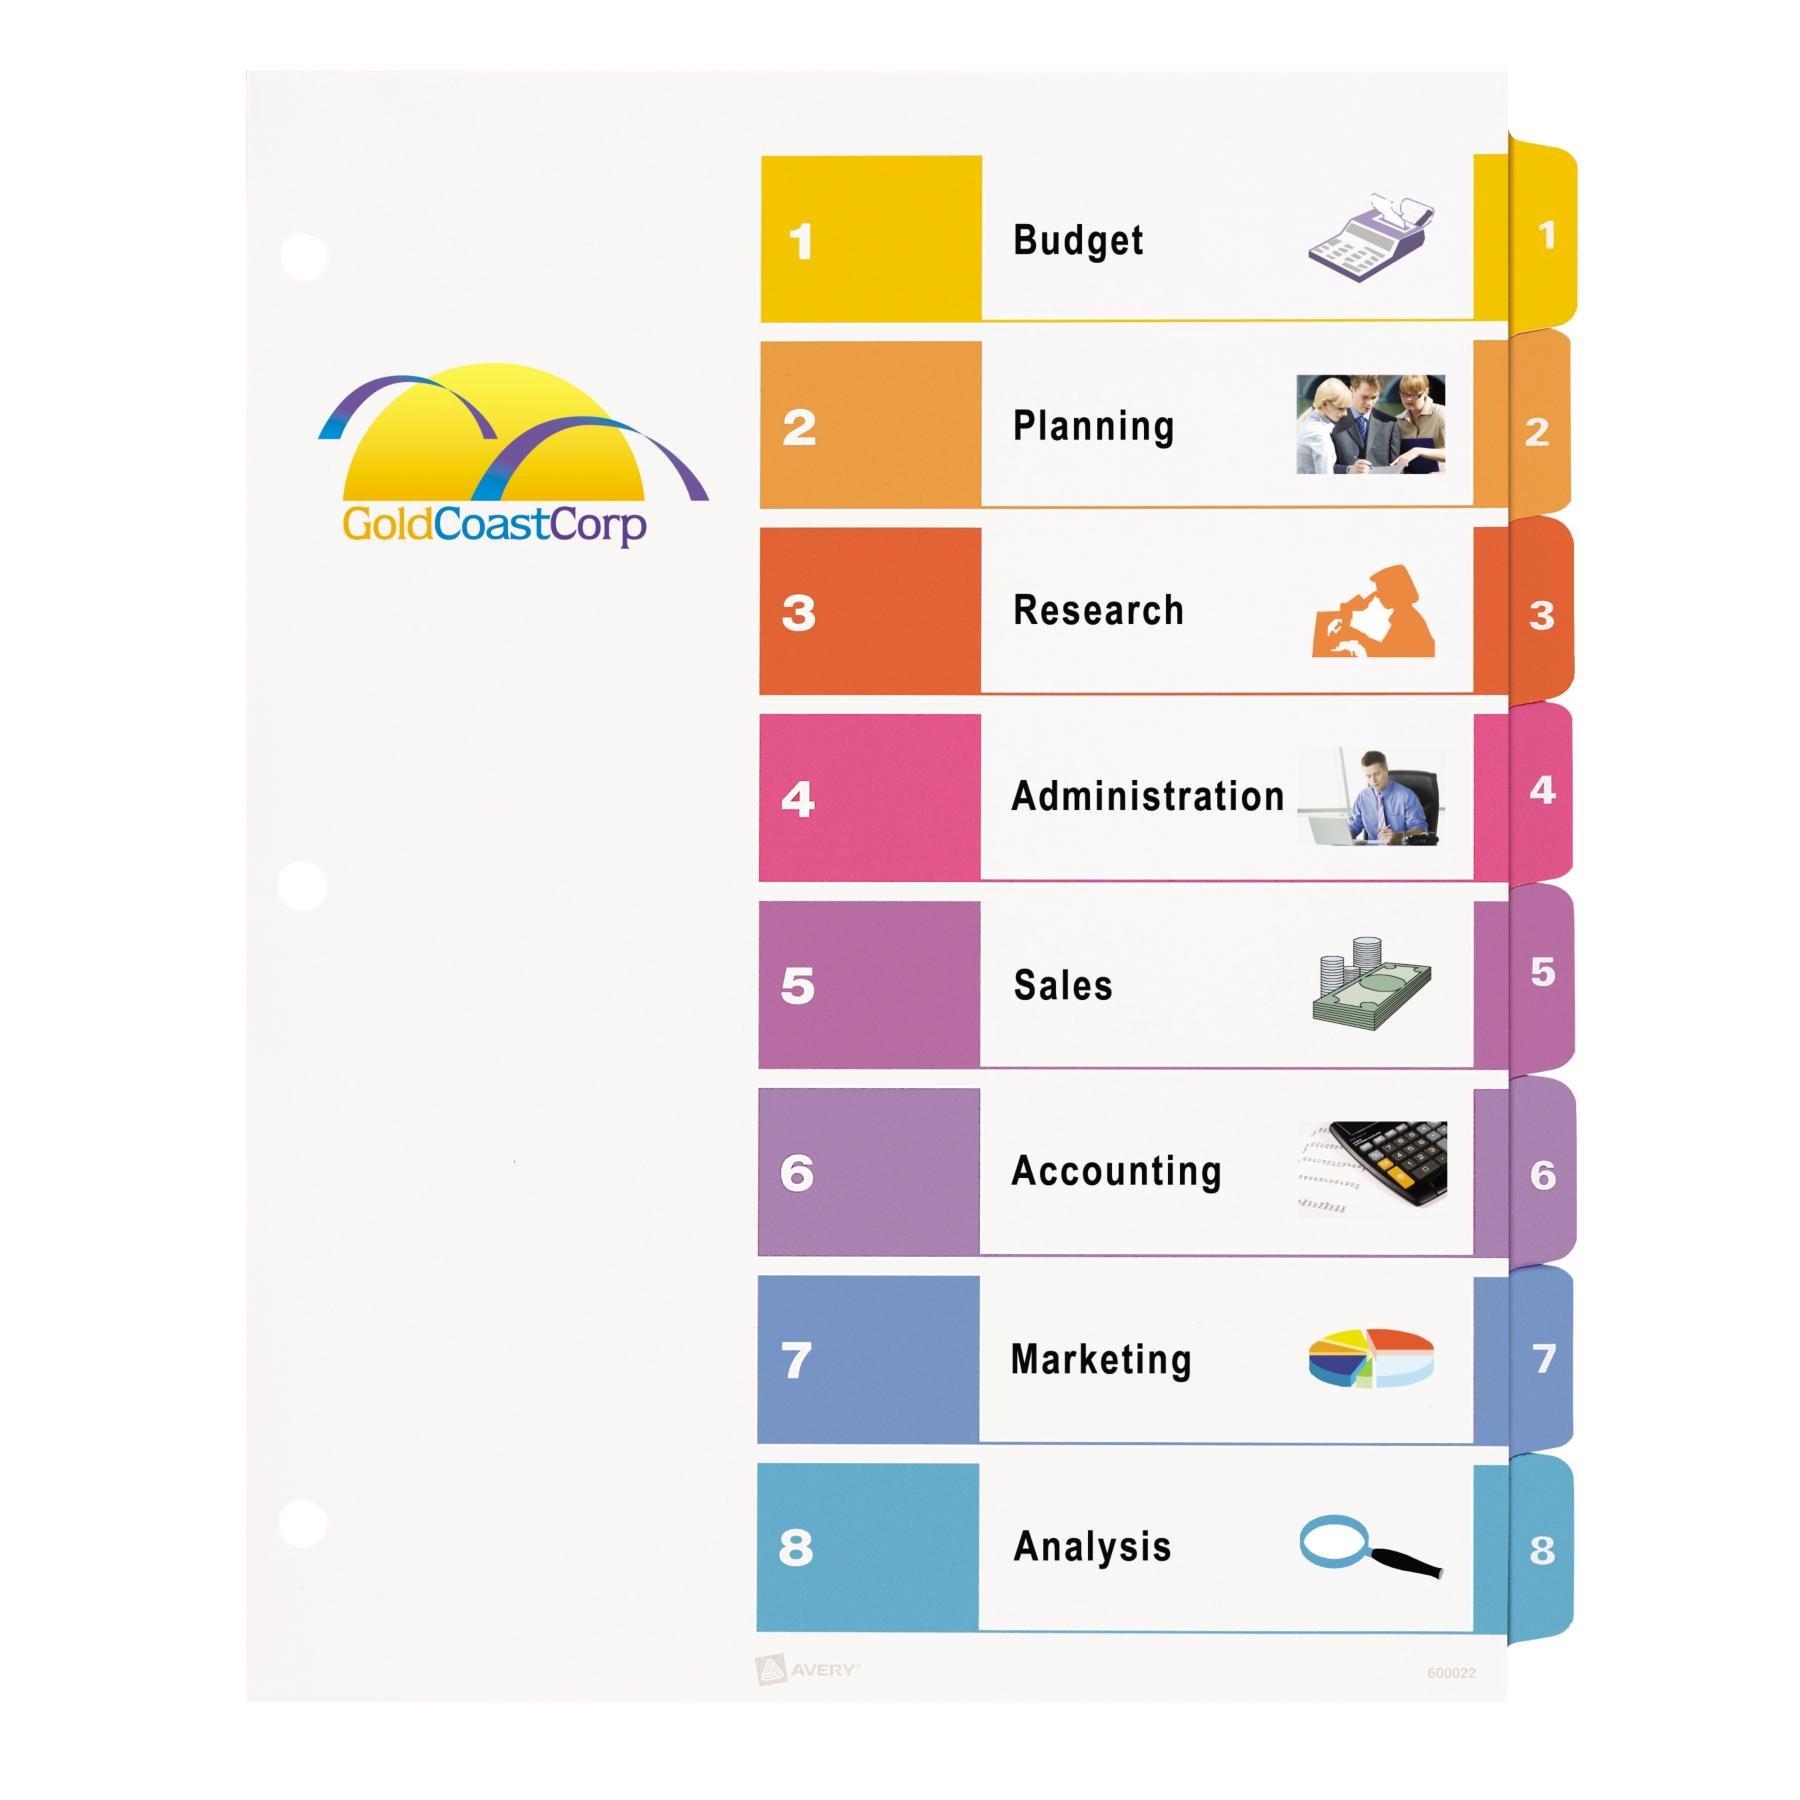 binder divider tab templates averycom